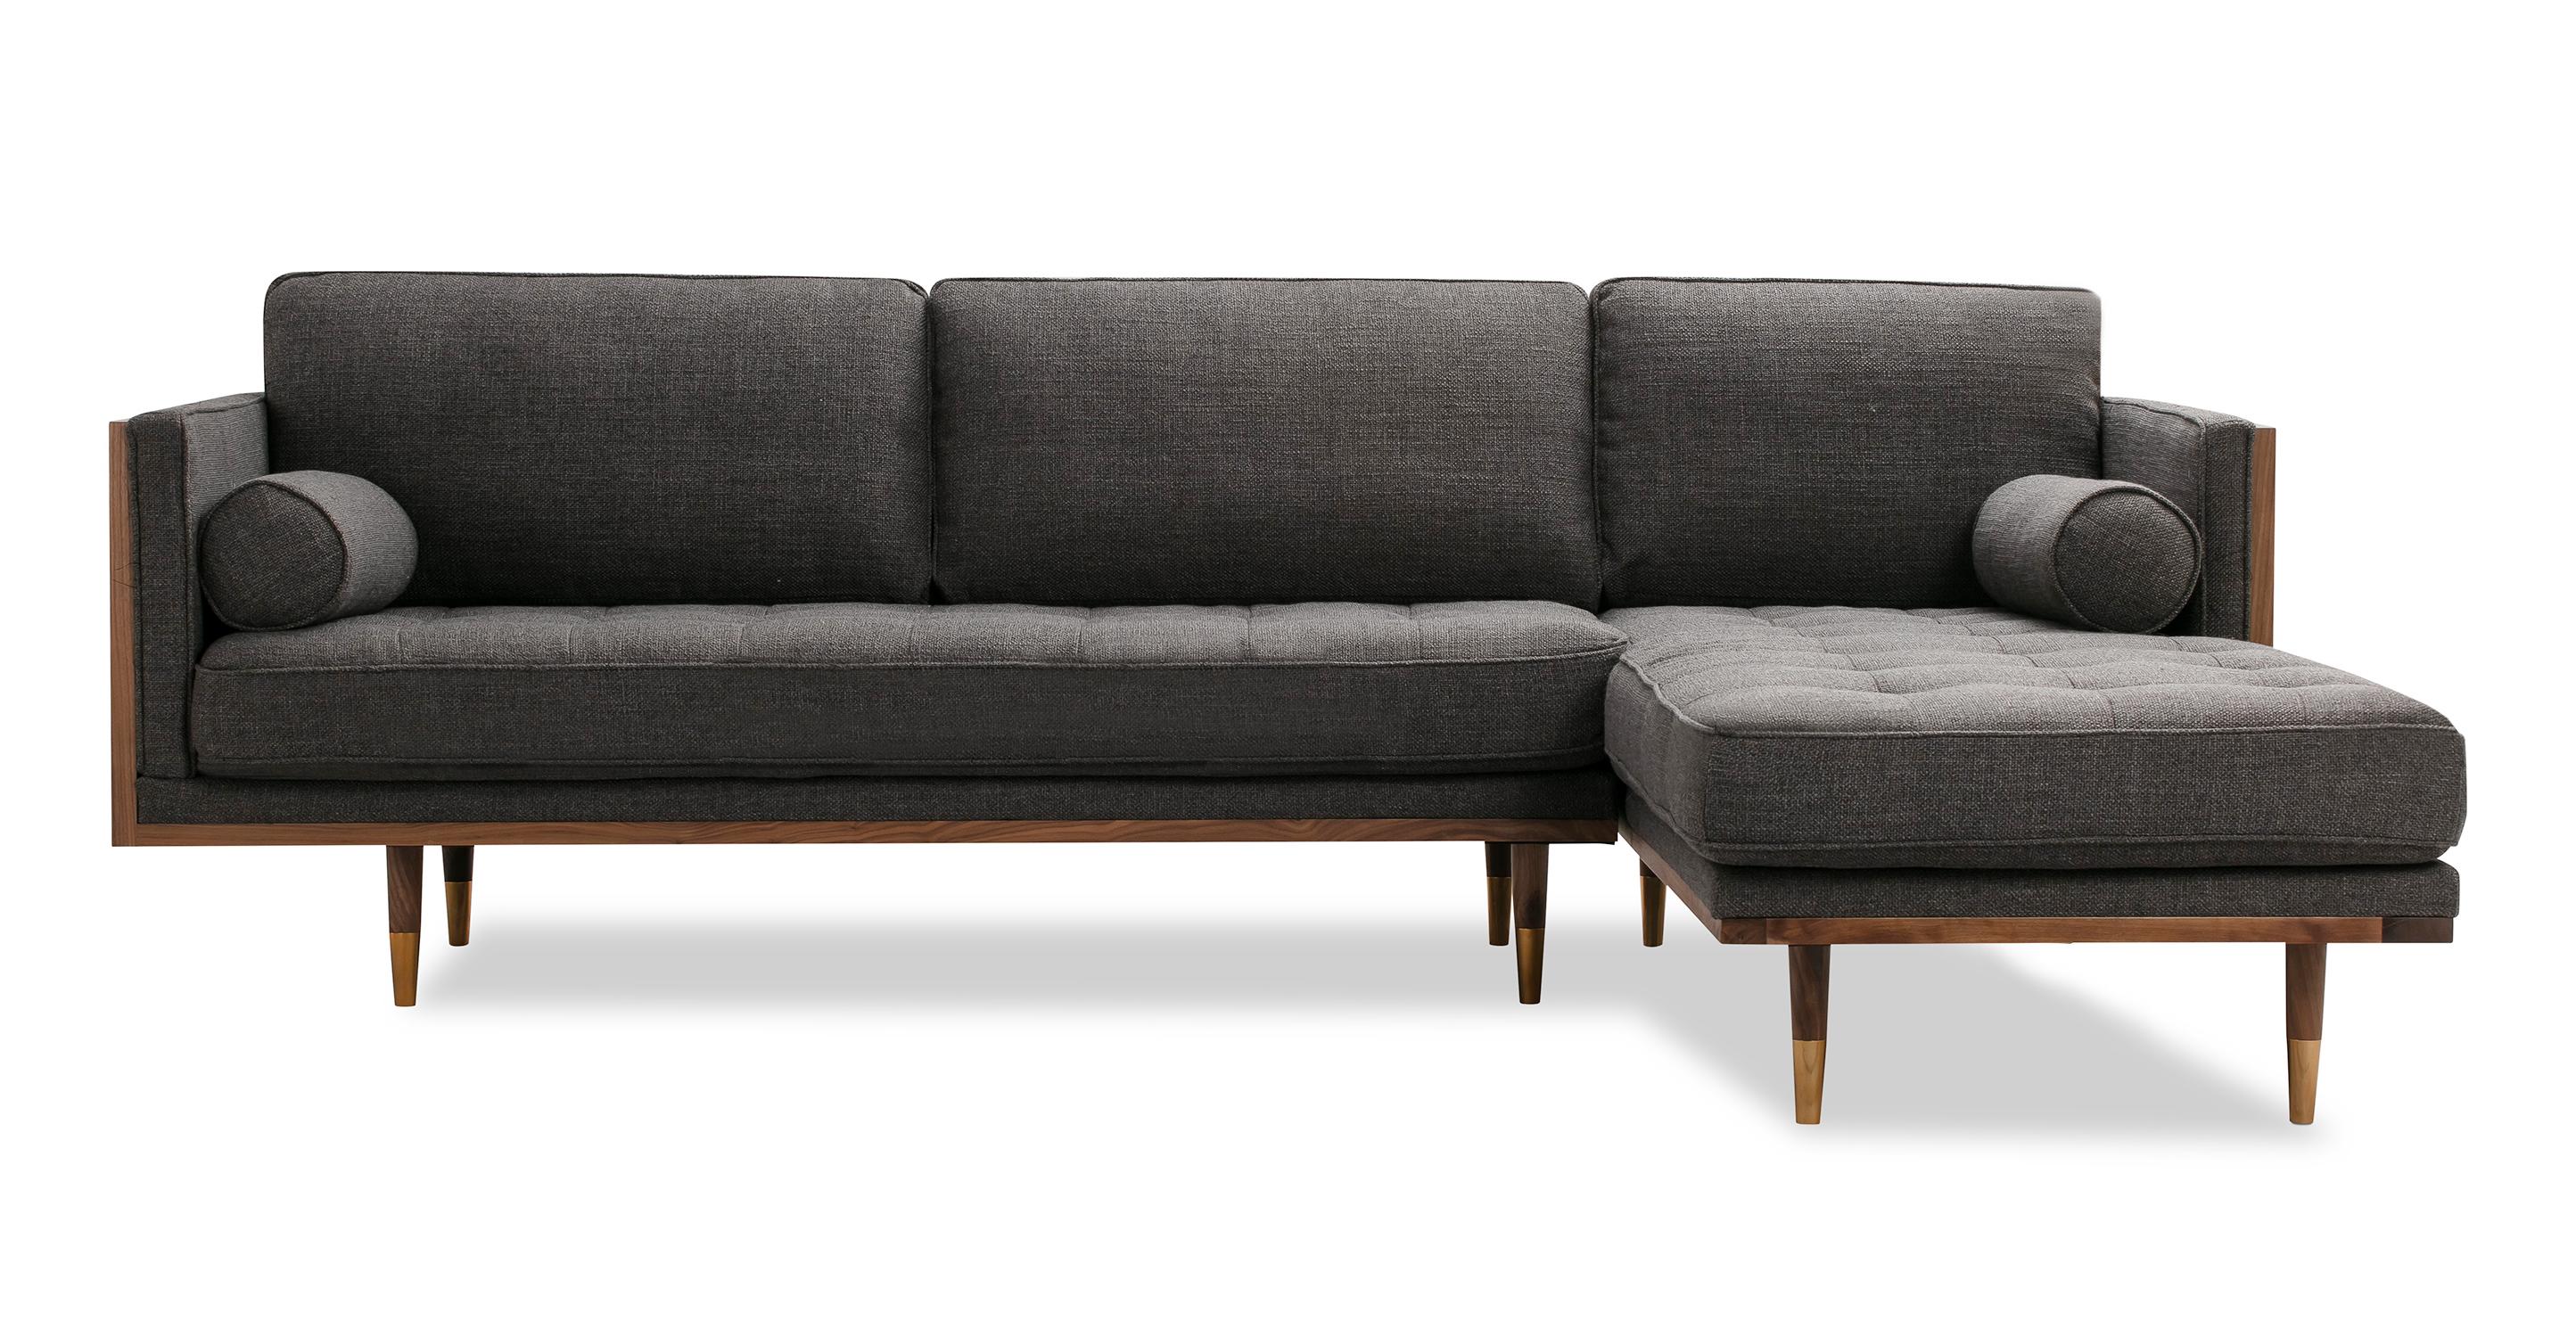 "Woodrow Skandi 100"" Fabric Sectional Right, Walnut/Dior Grey"